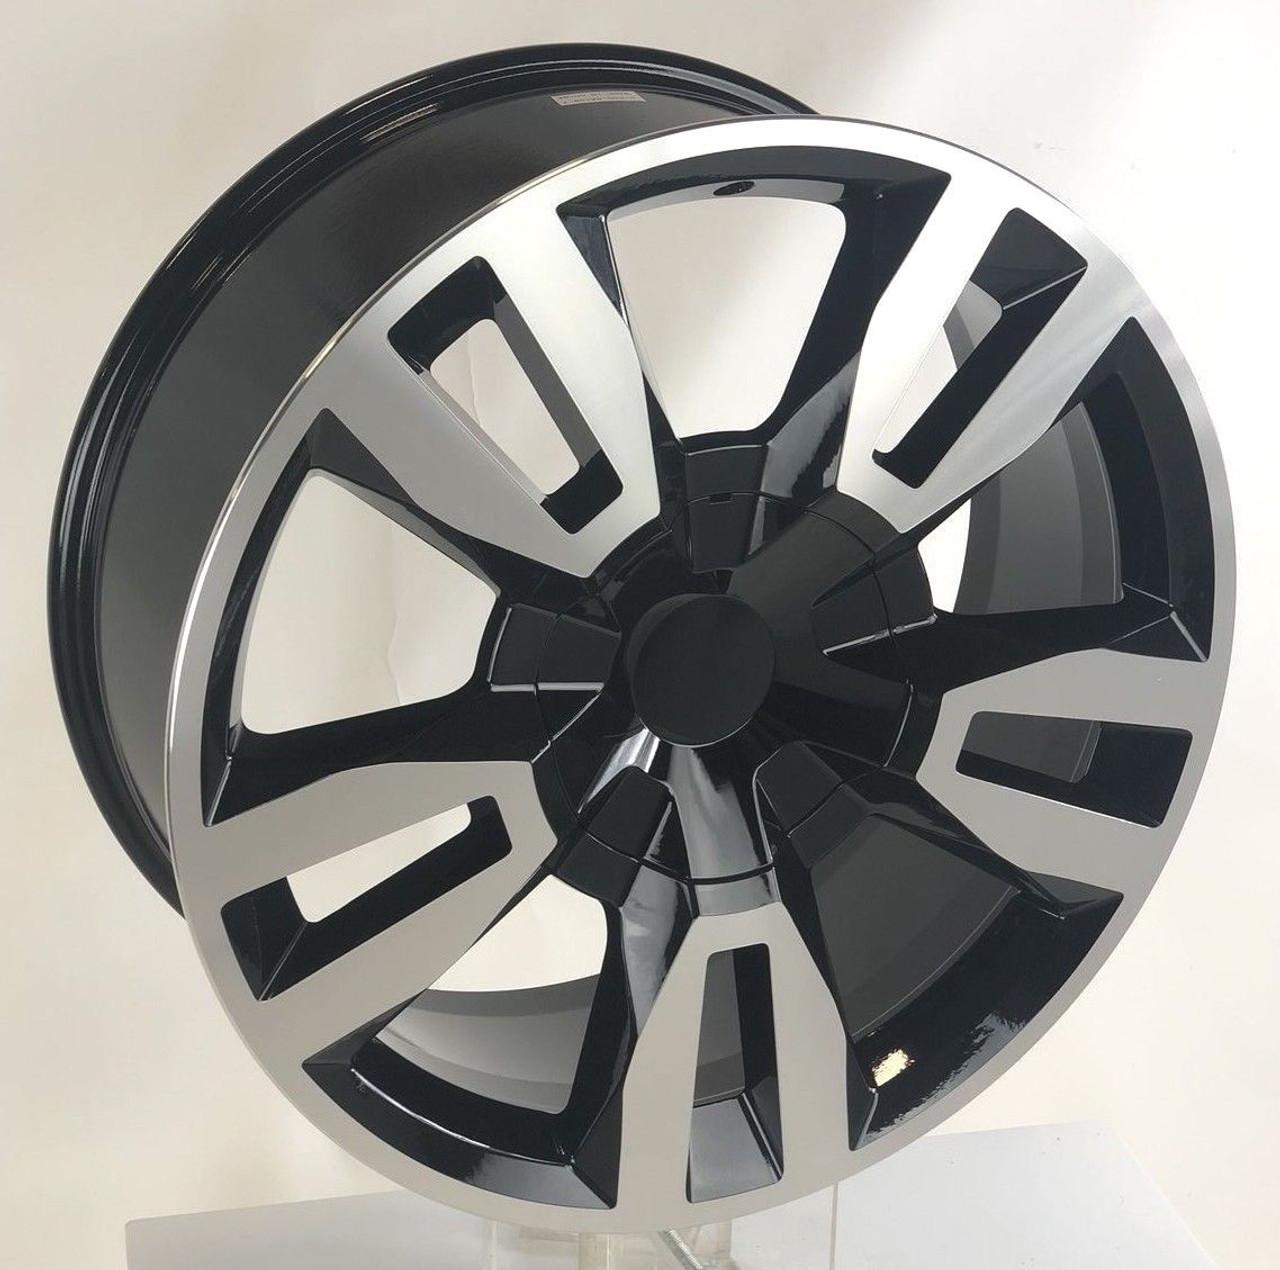 "Black and Machine 22"" RST Style Split Spoke Wheels for Chevy Silverado, Tahoe, Suburban - New Set of 4"